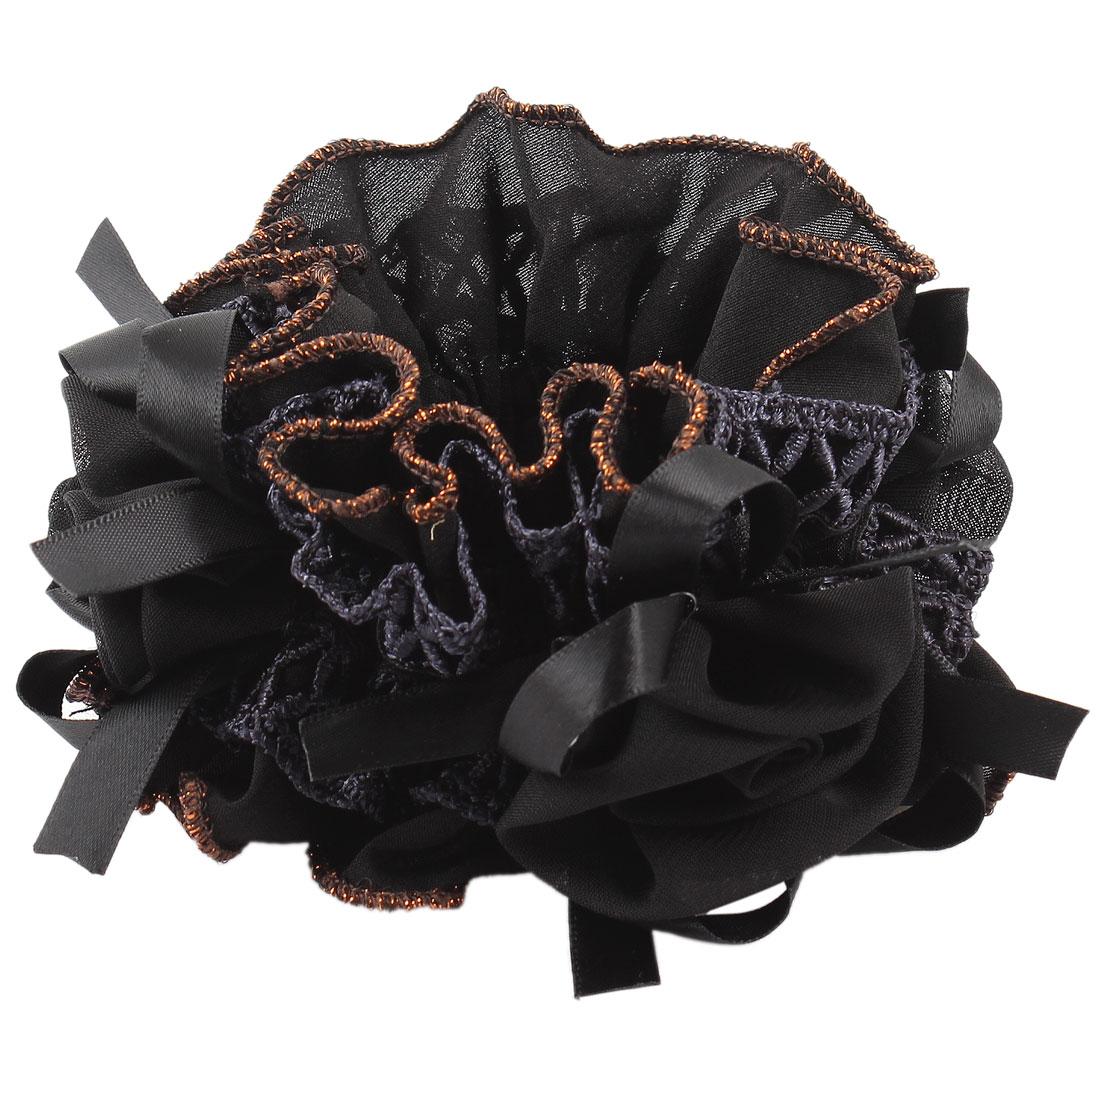 Black Chiffon Flower Decoration Elastic Hair Tie Hairband Ponytail Scrunchie Holder